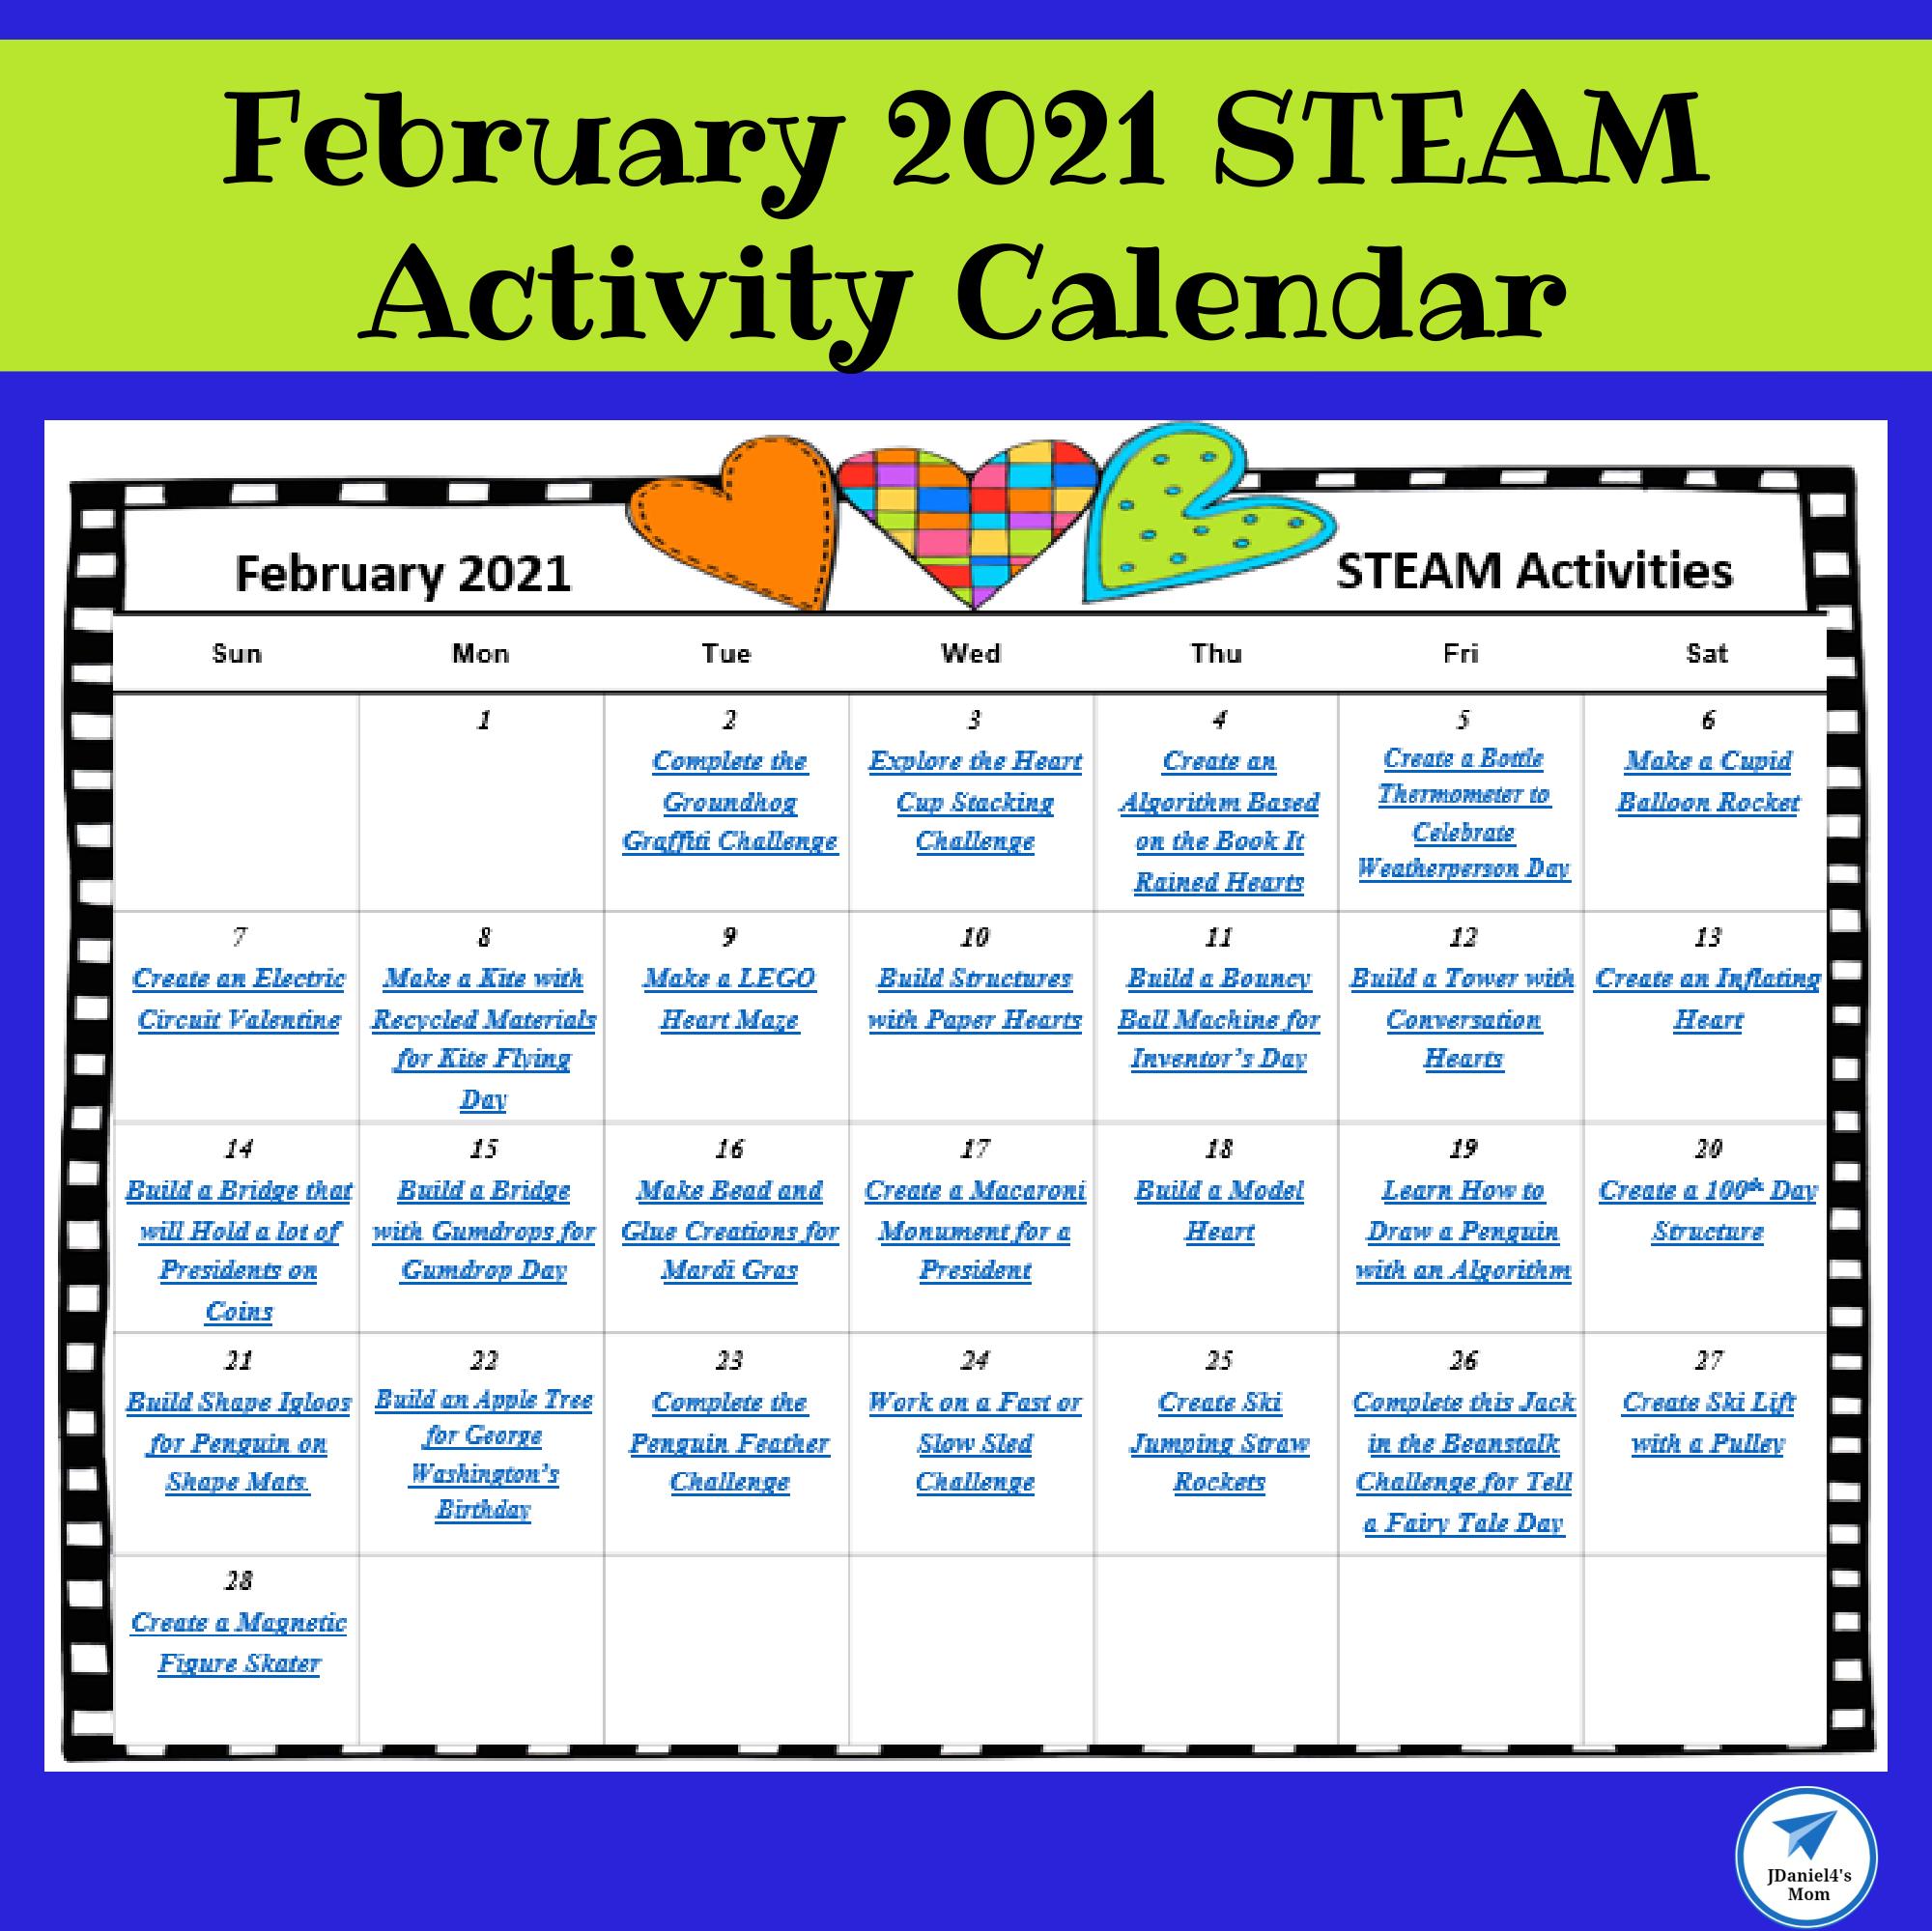 February 2021 STEAM Activity Calendar